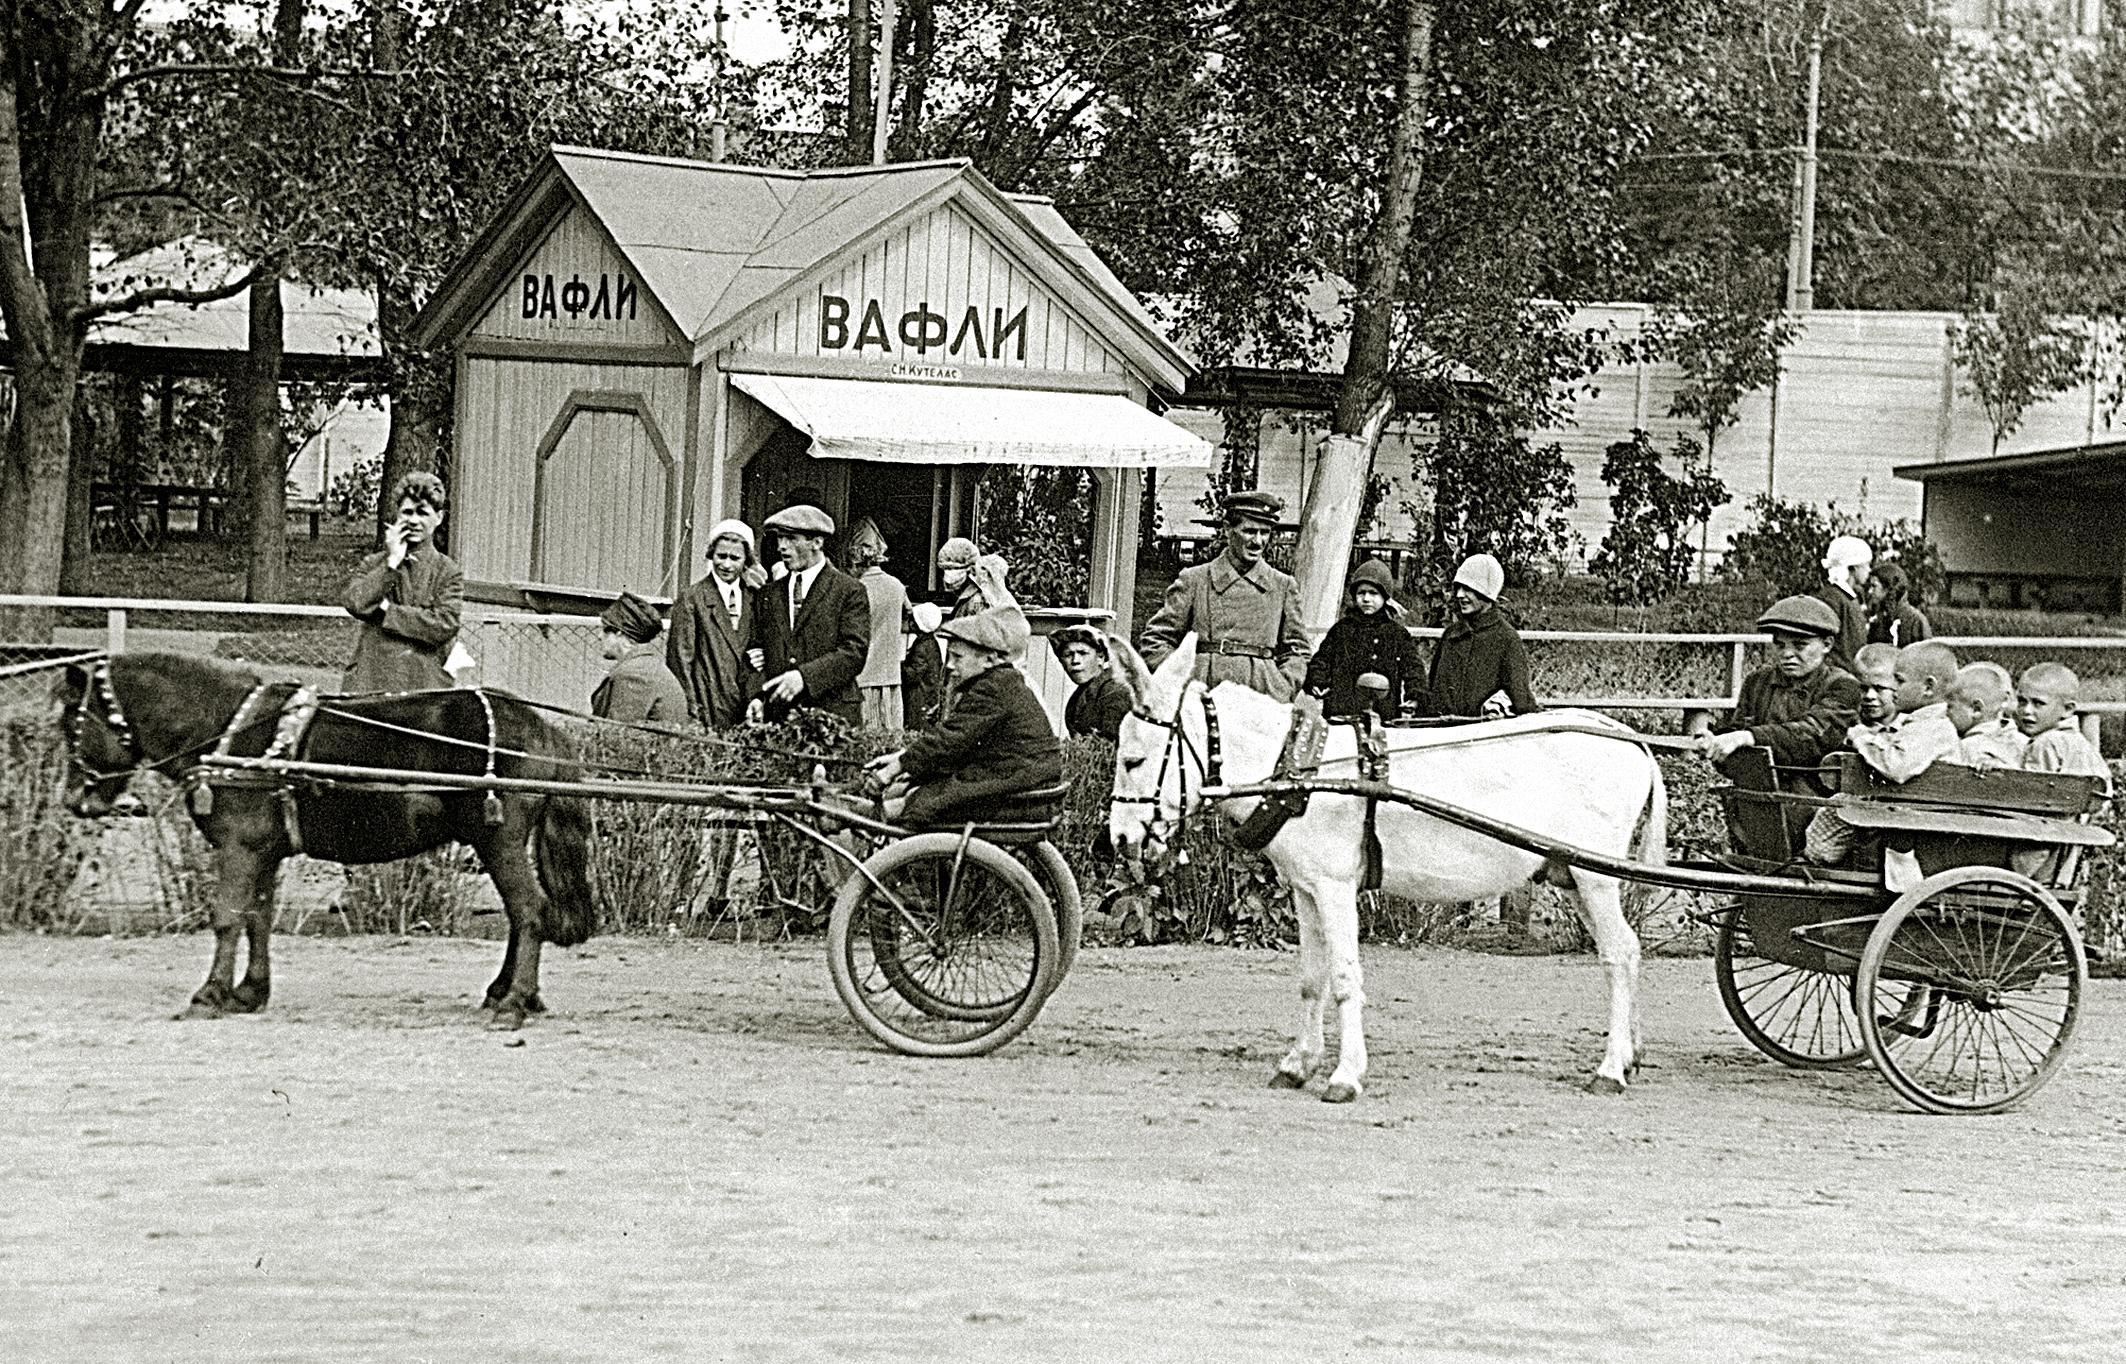 Катание на ослах и пони, 1930-е годы. Фото: архив Московского зоопарка.